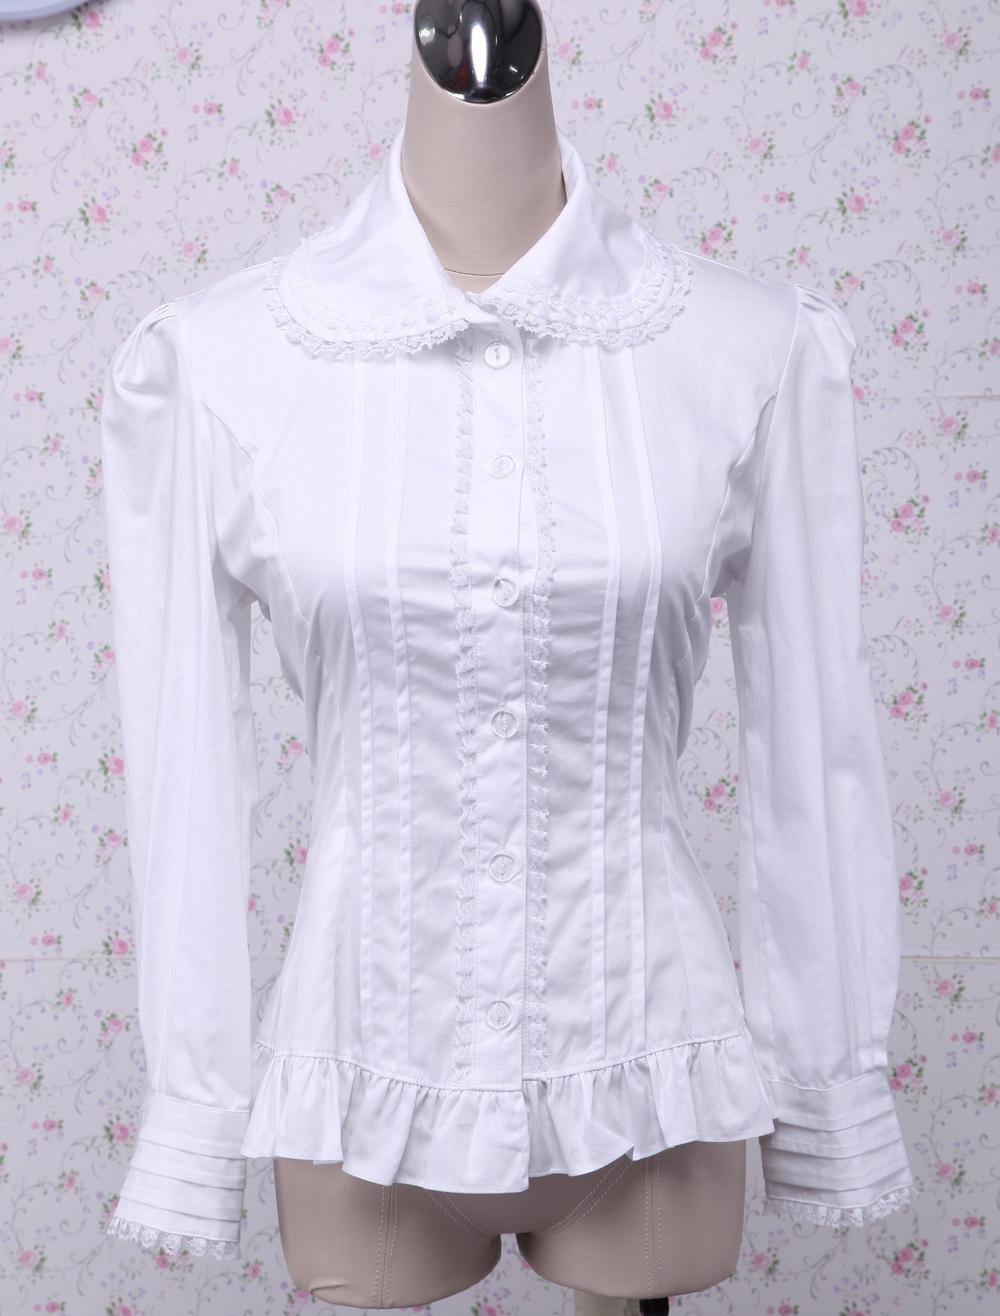 Cotton White Ruffles Long Sleeves Lolita Blouse